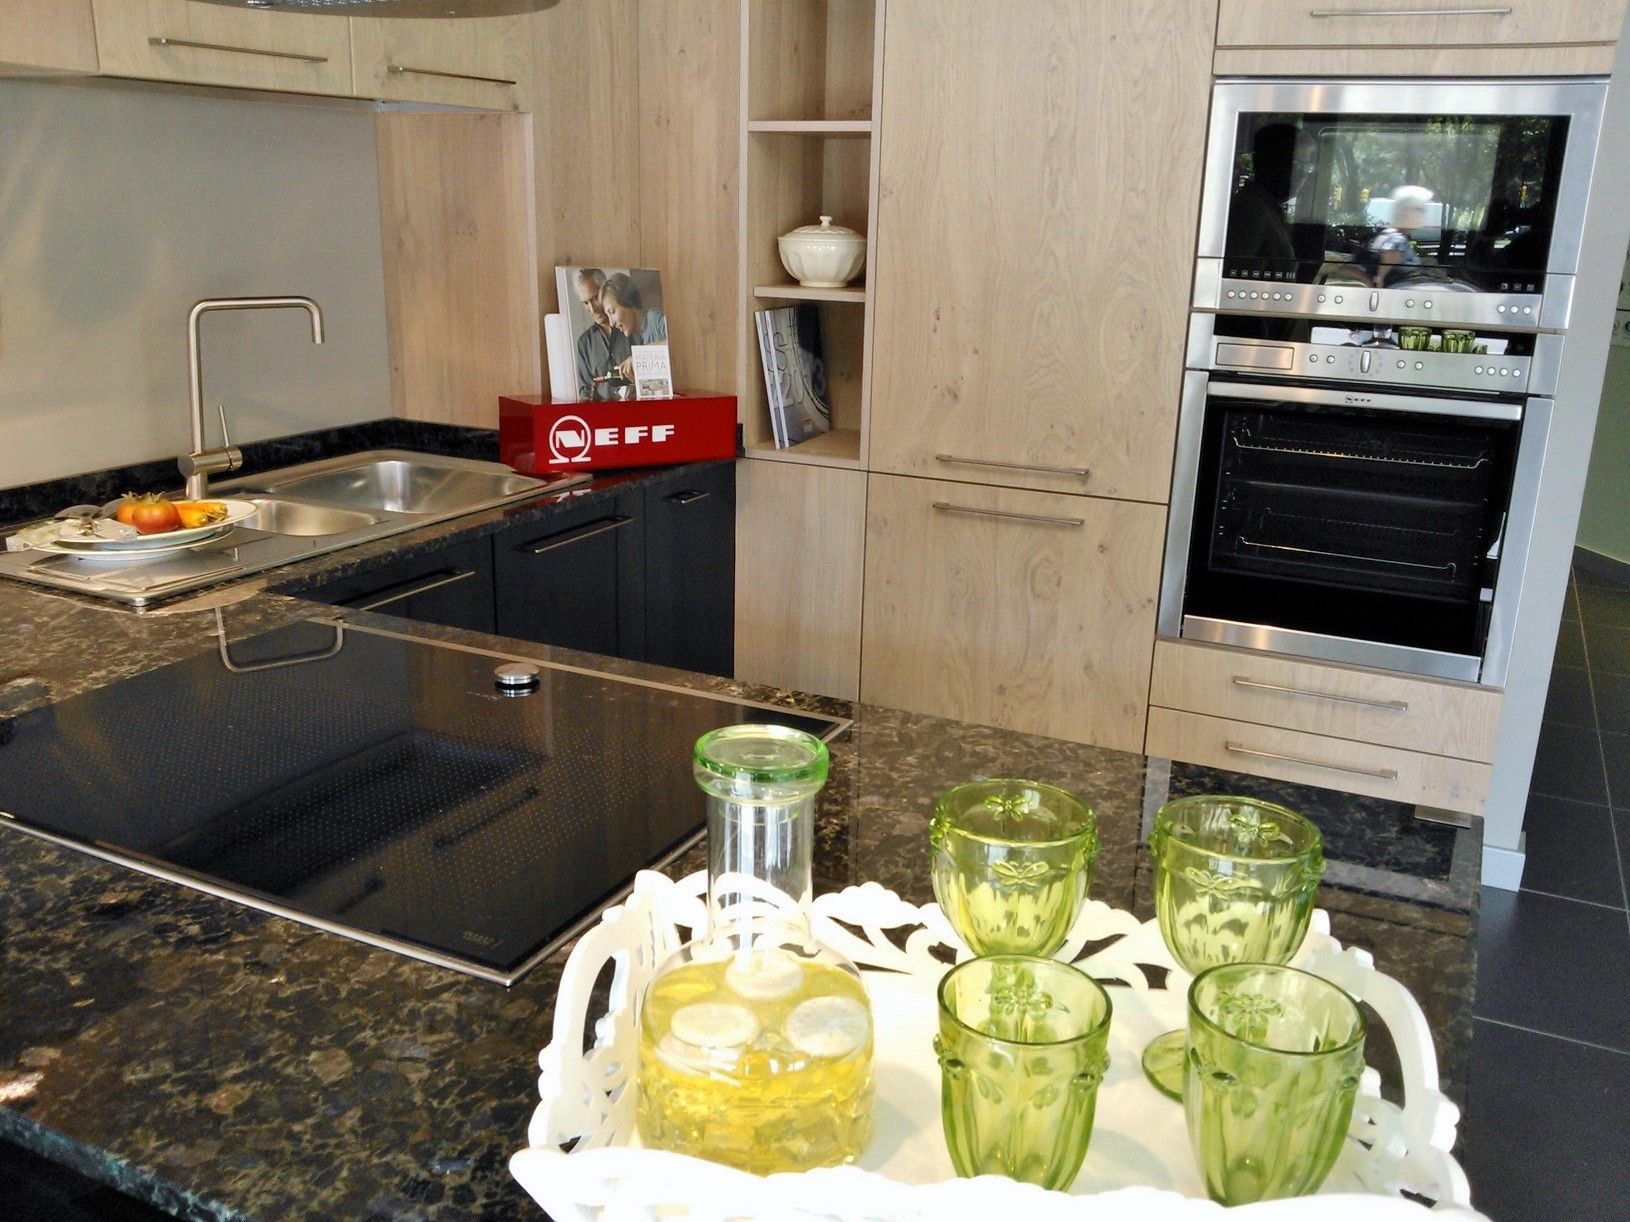 Muebles de cocina schmidt with muebles de cocina schmidt - Cocinas schmidt opiniones ...